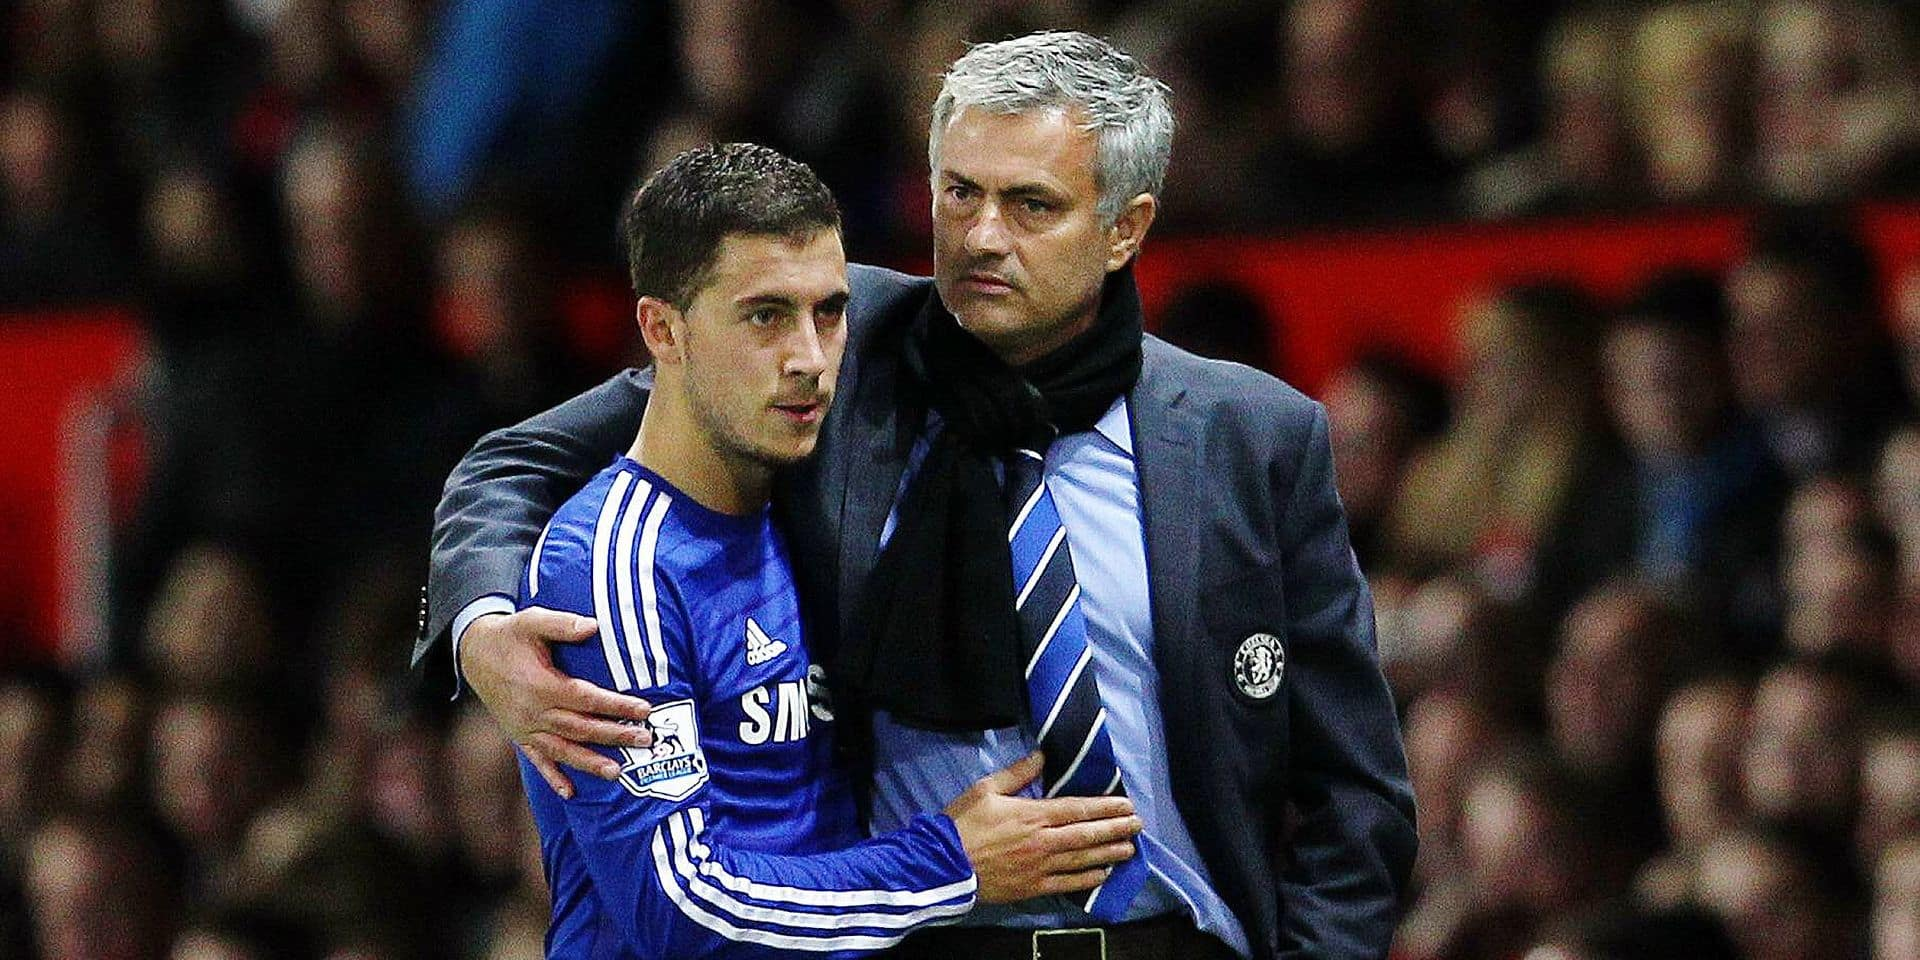 Chelsea manager Jose Mourinho with his arm around Eden Hazard BPI_MW_ManUtd_Chelsea_76 JPG PUBLICATI